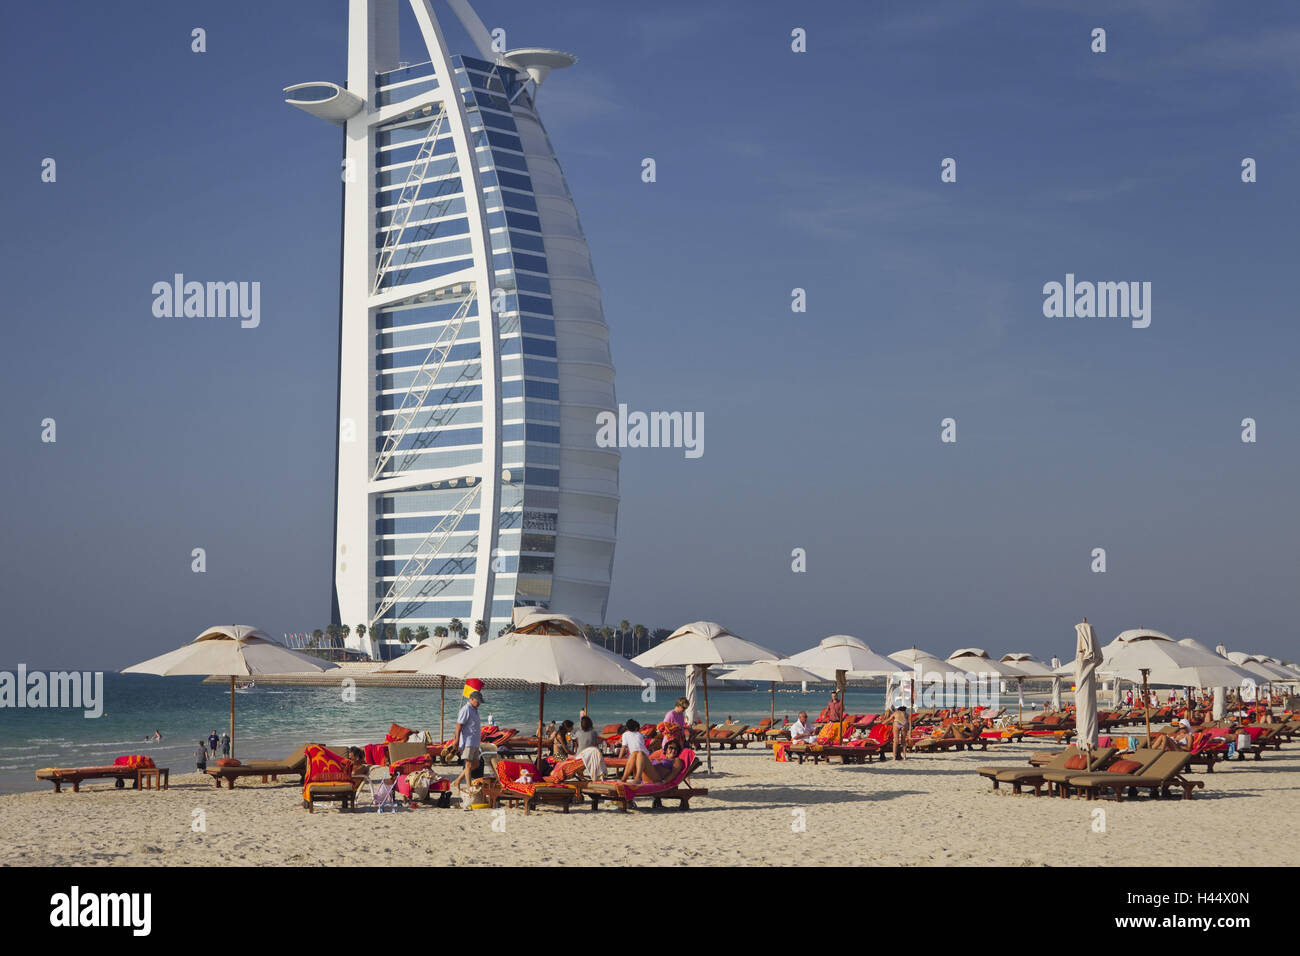 United Arab Emirates, Dubai, Burj Al Arab, Jumeirah Beach, bathers, - Stock Image